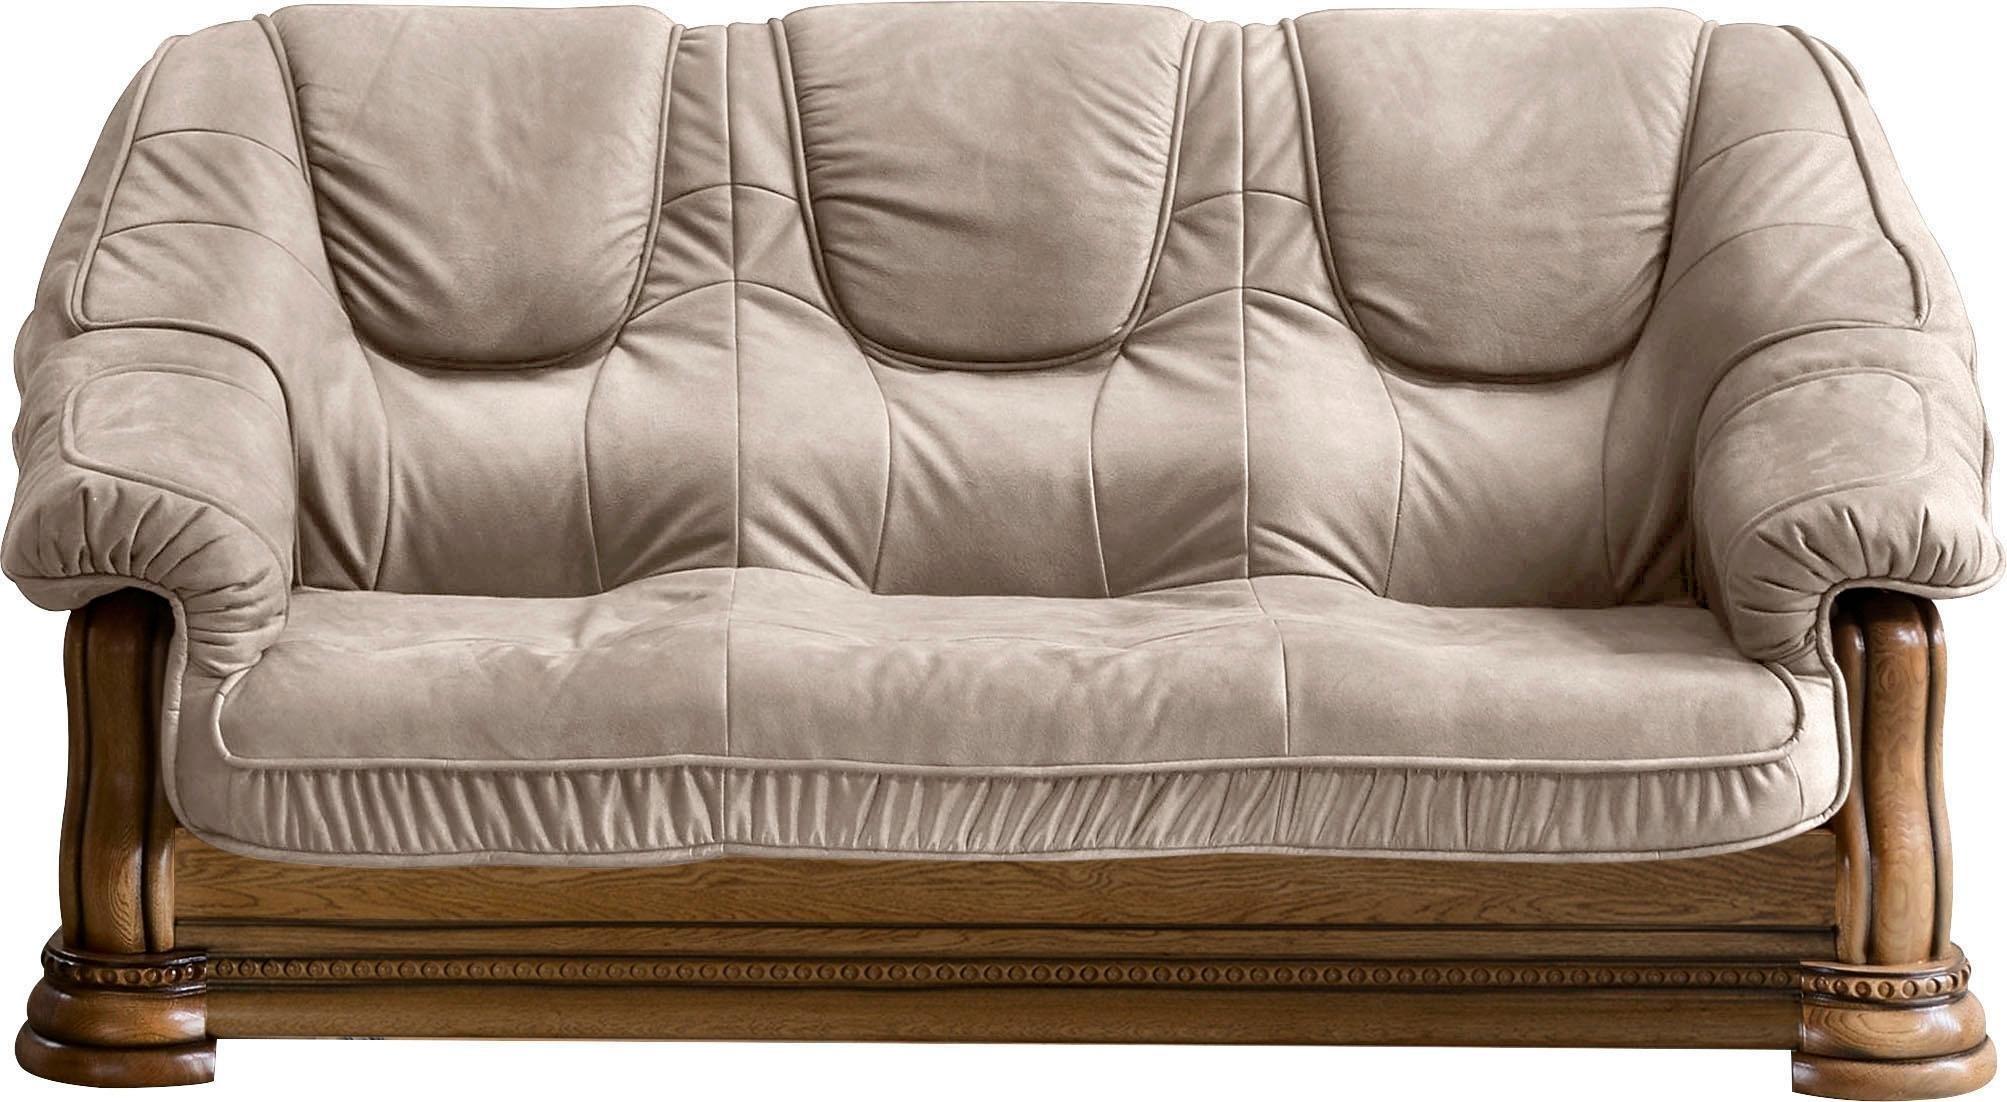 Premium collection by Home affaire 3-zitsbank Grizzly bij OTTO online kopen